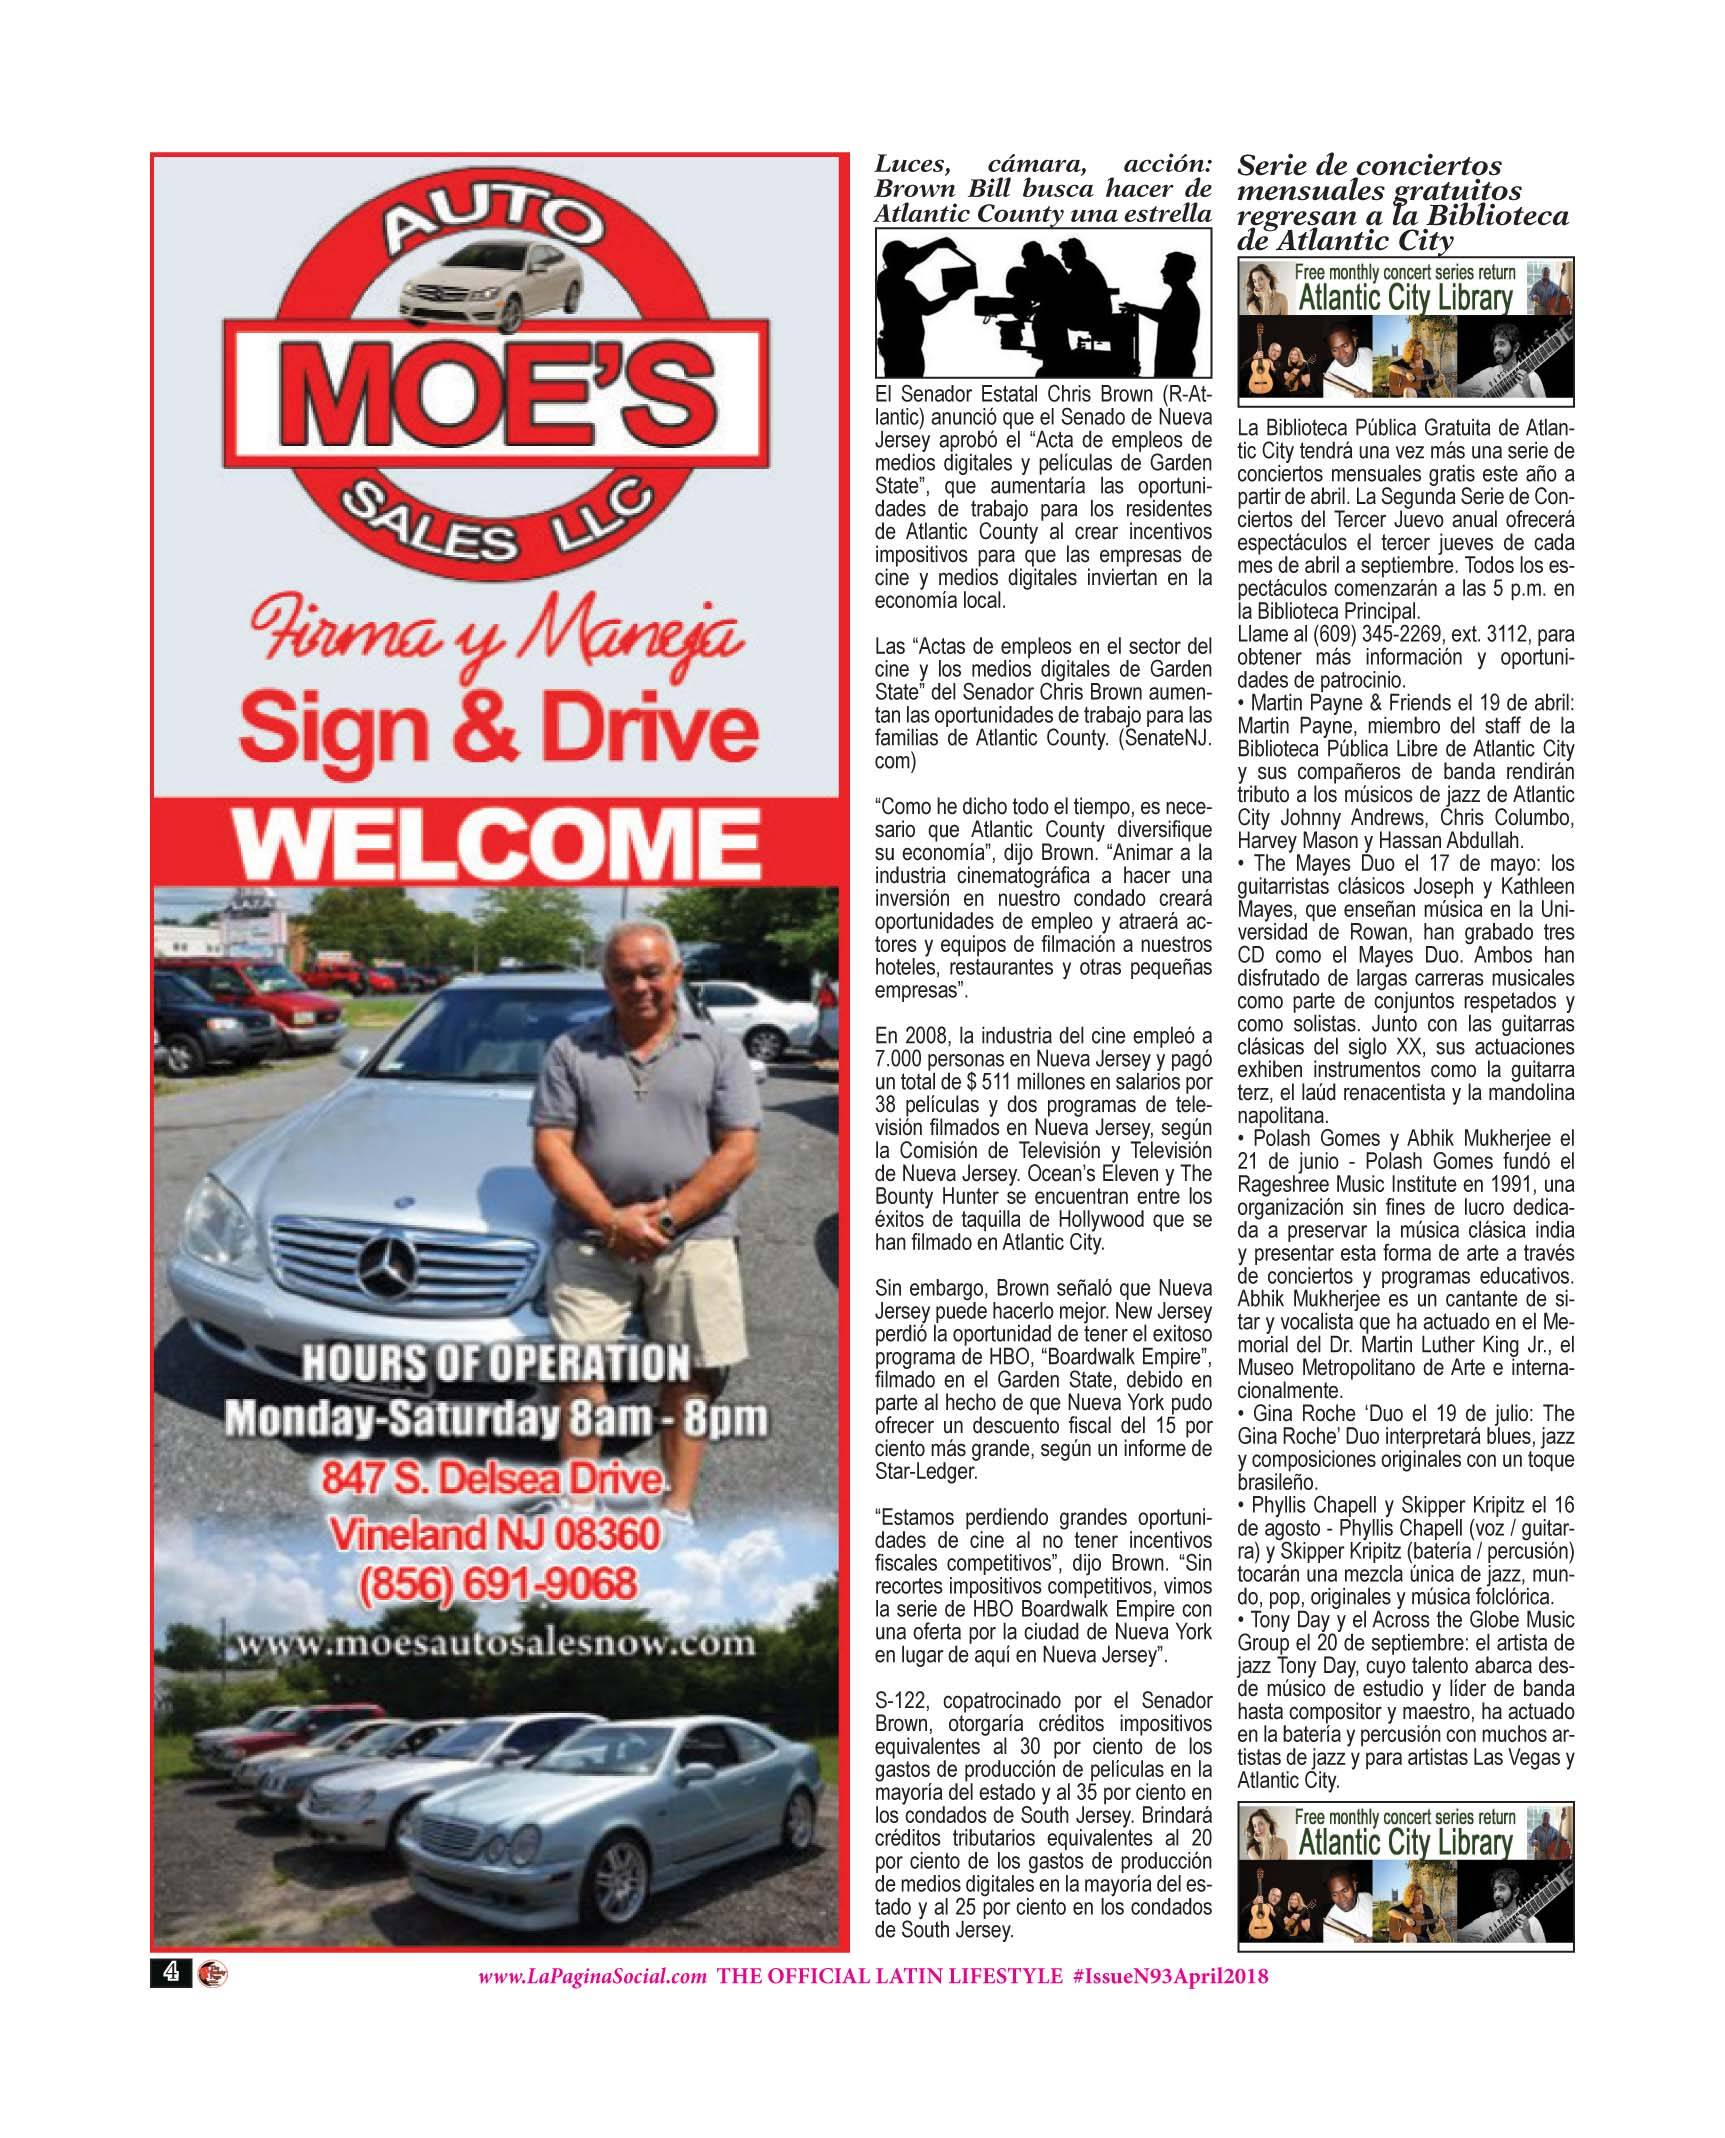 Moes Auto Sales, Chris Brown, Atlantic City Public Library